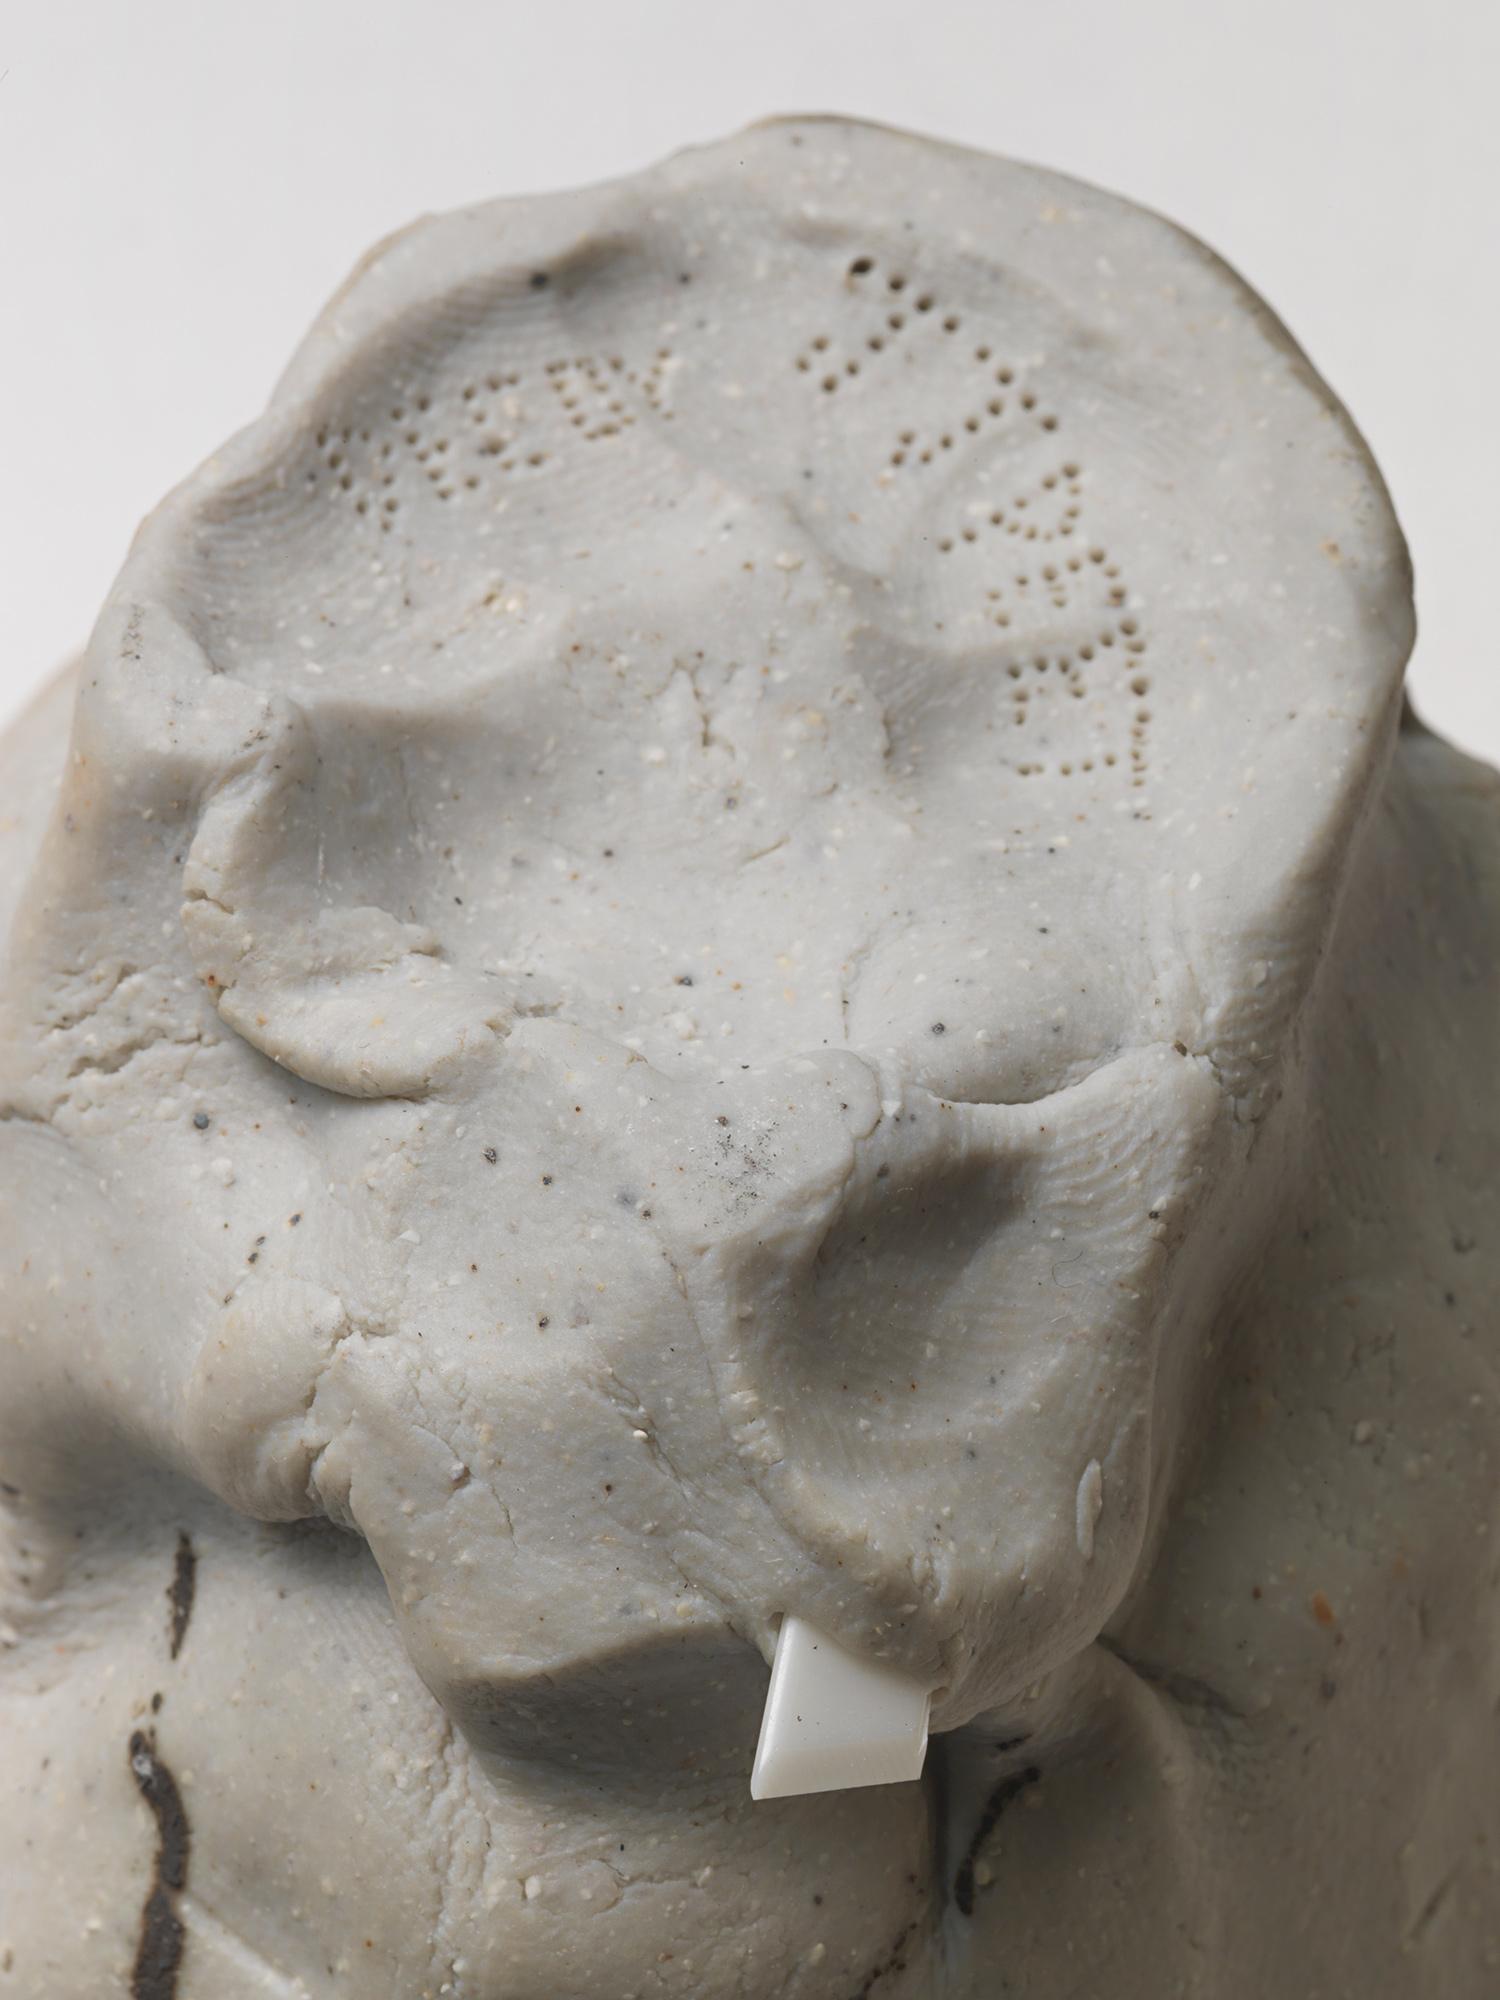 "DECOY_Cup_6 . Detail. Porcelain, cardboard, granite. 8.5"" x 9"" x 8.5"". 2014."